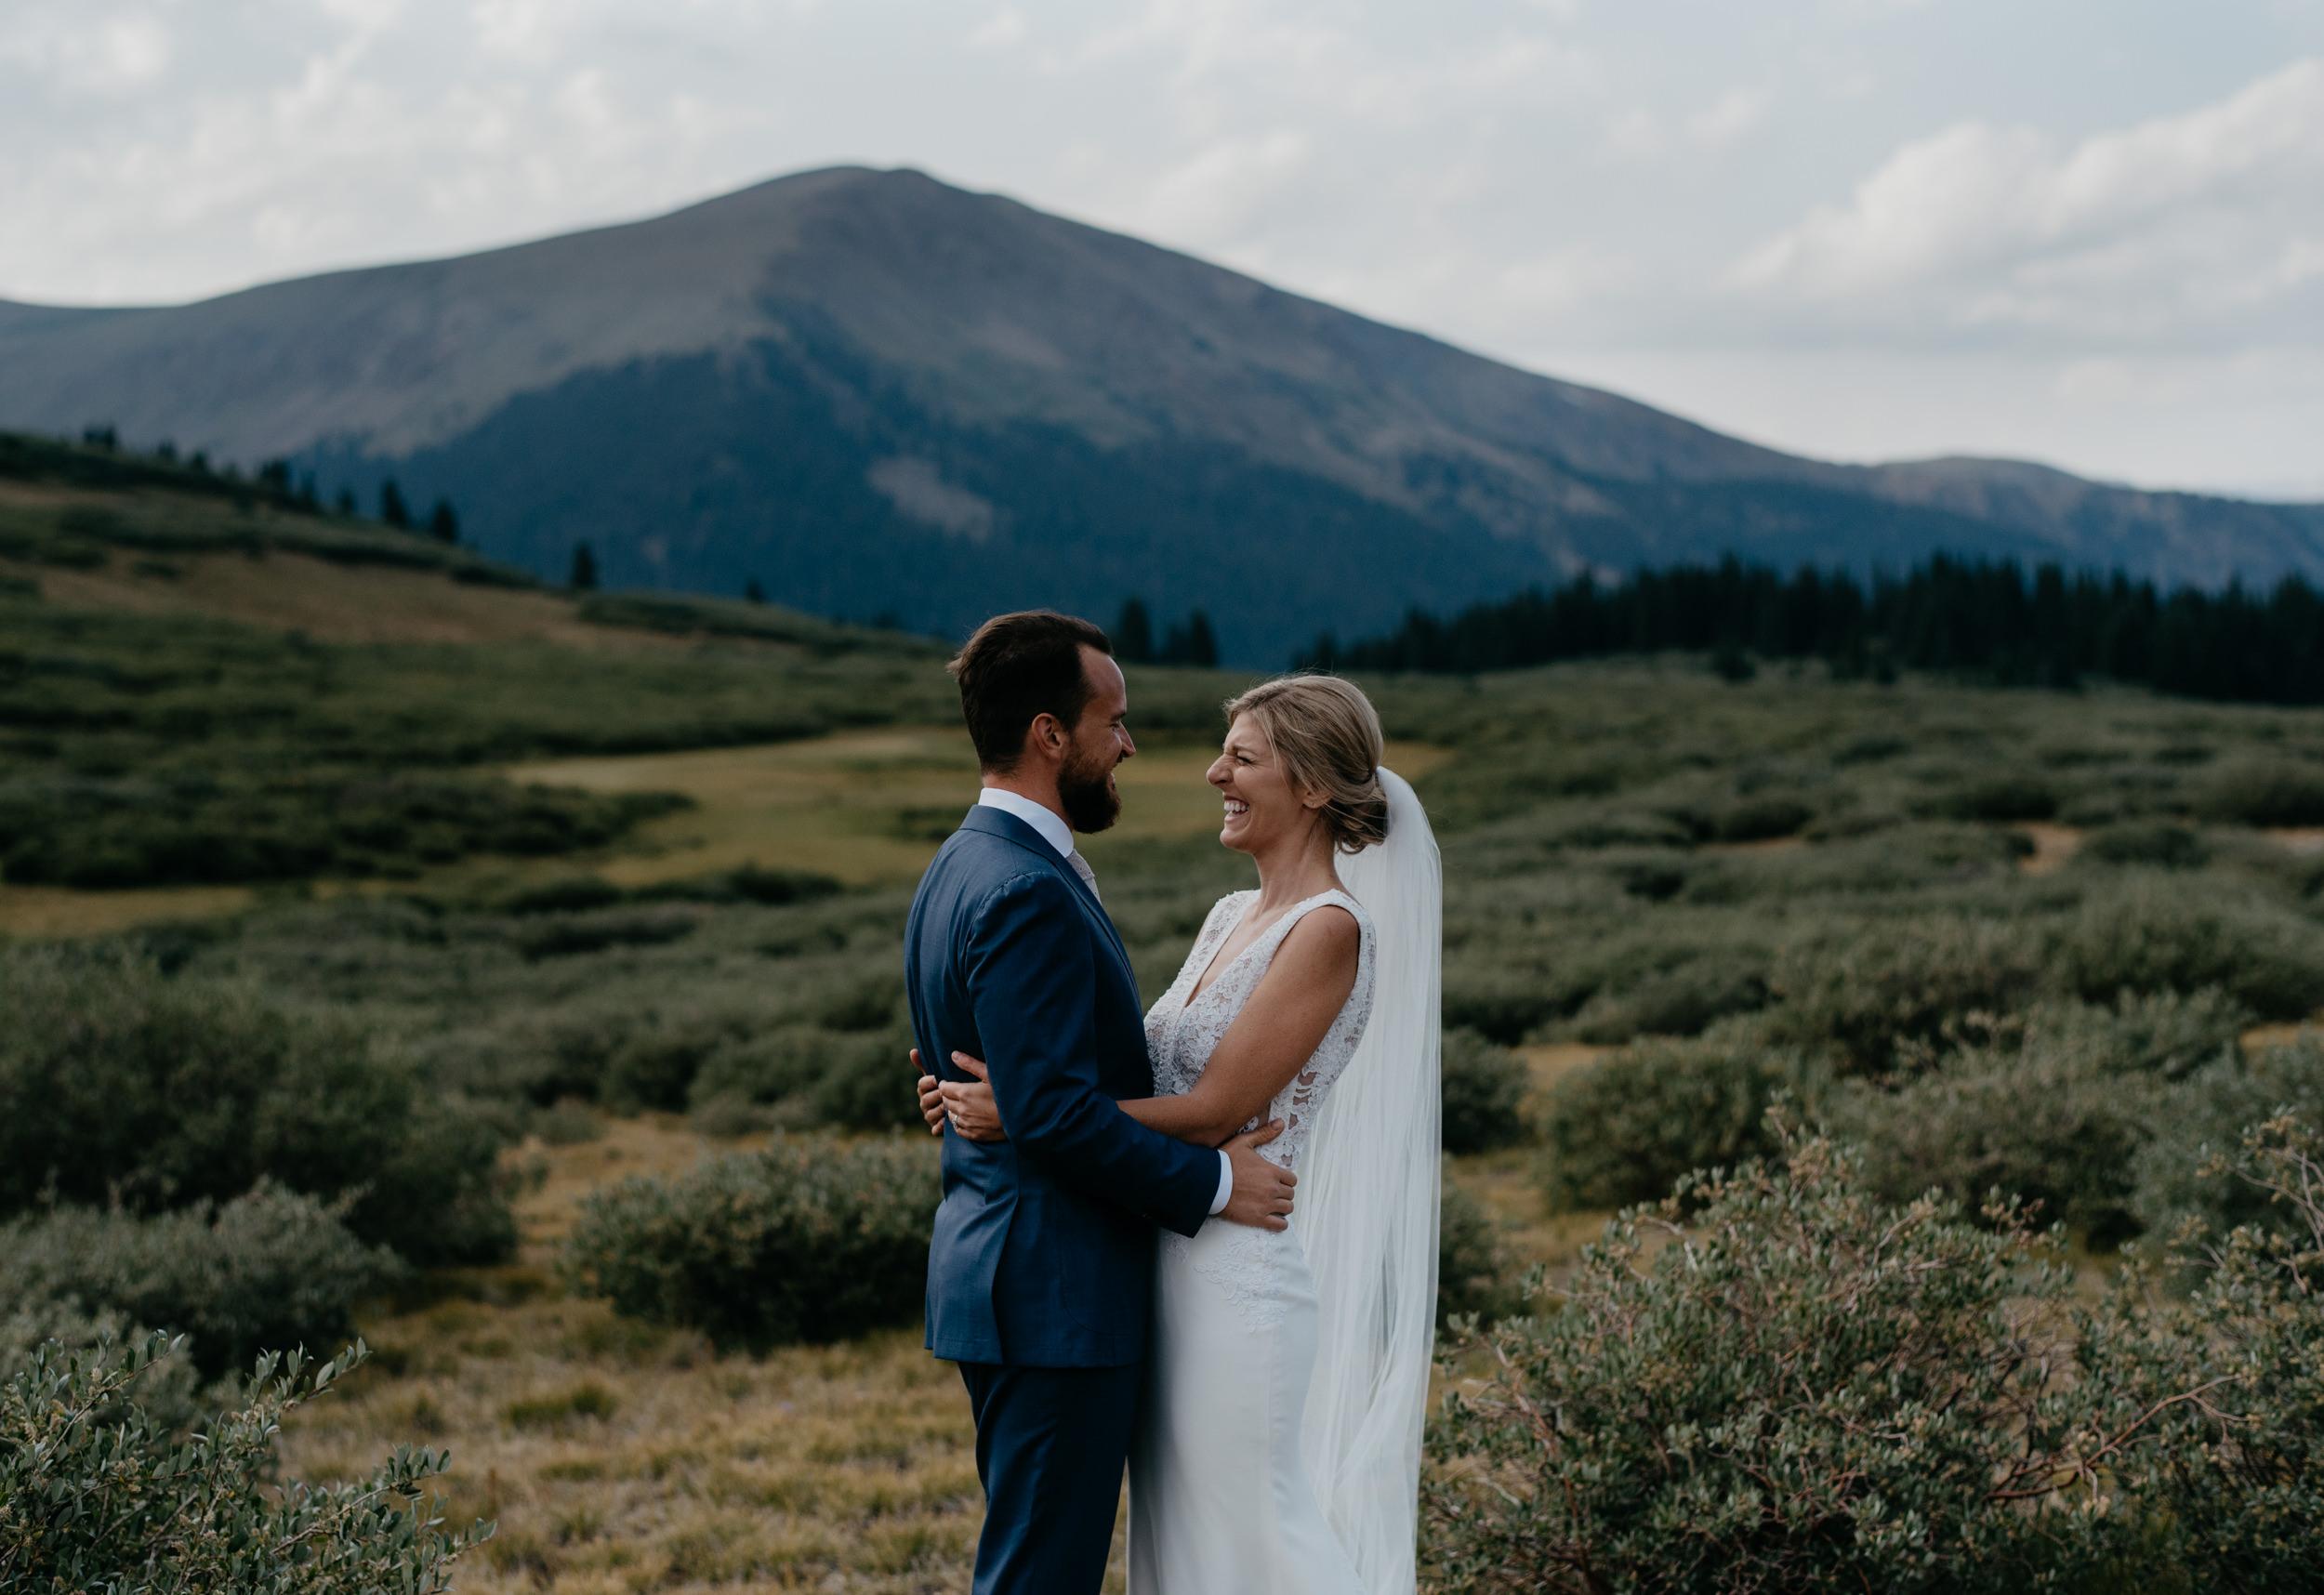 Colorado wedding photographer based in Denver. Colorado elopement inspiration.